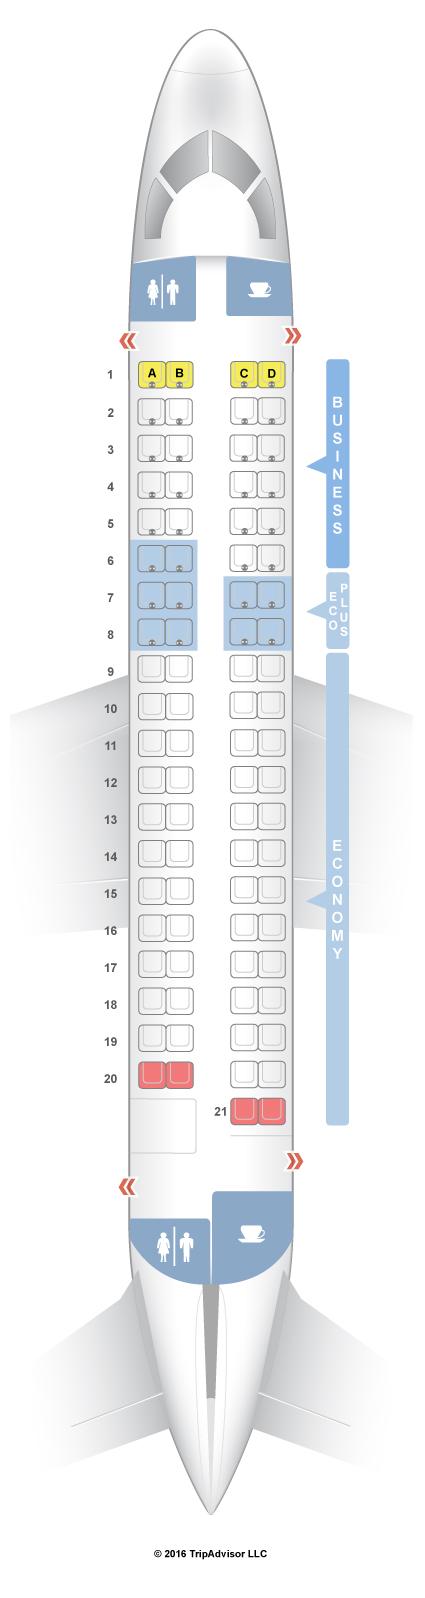 Seatguru Seat Map Lot Polish Airlines Embraer Erj 175 E75